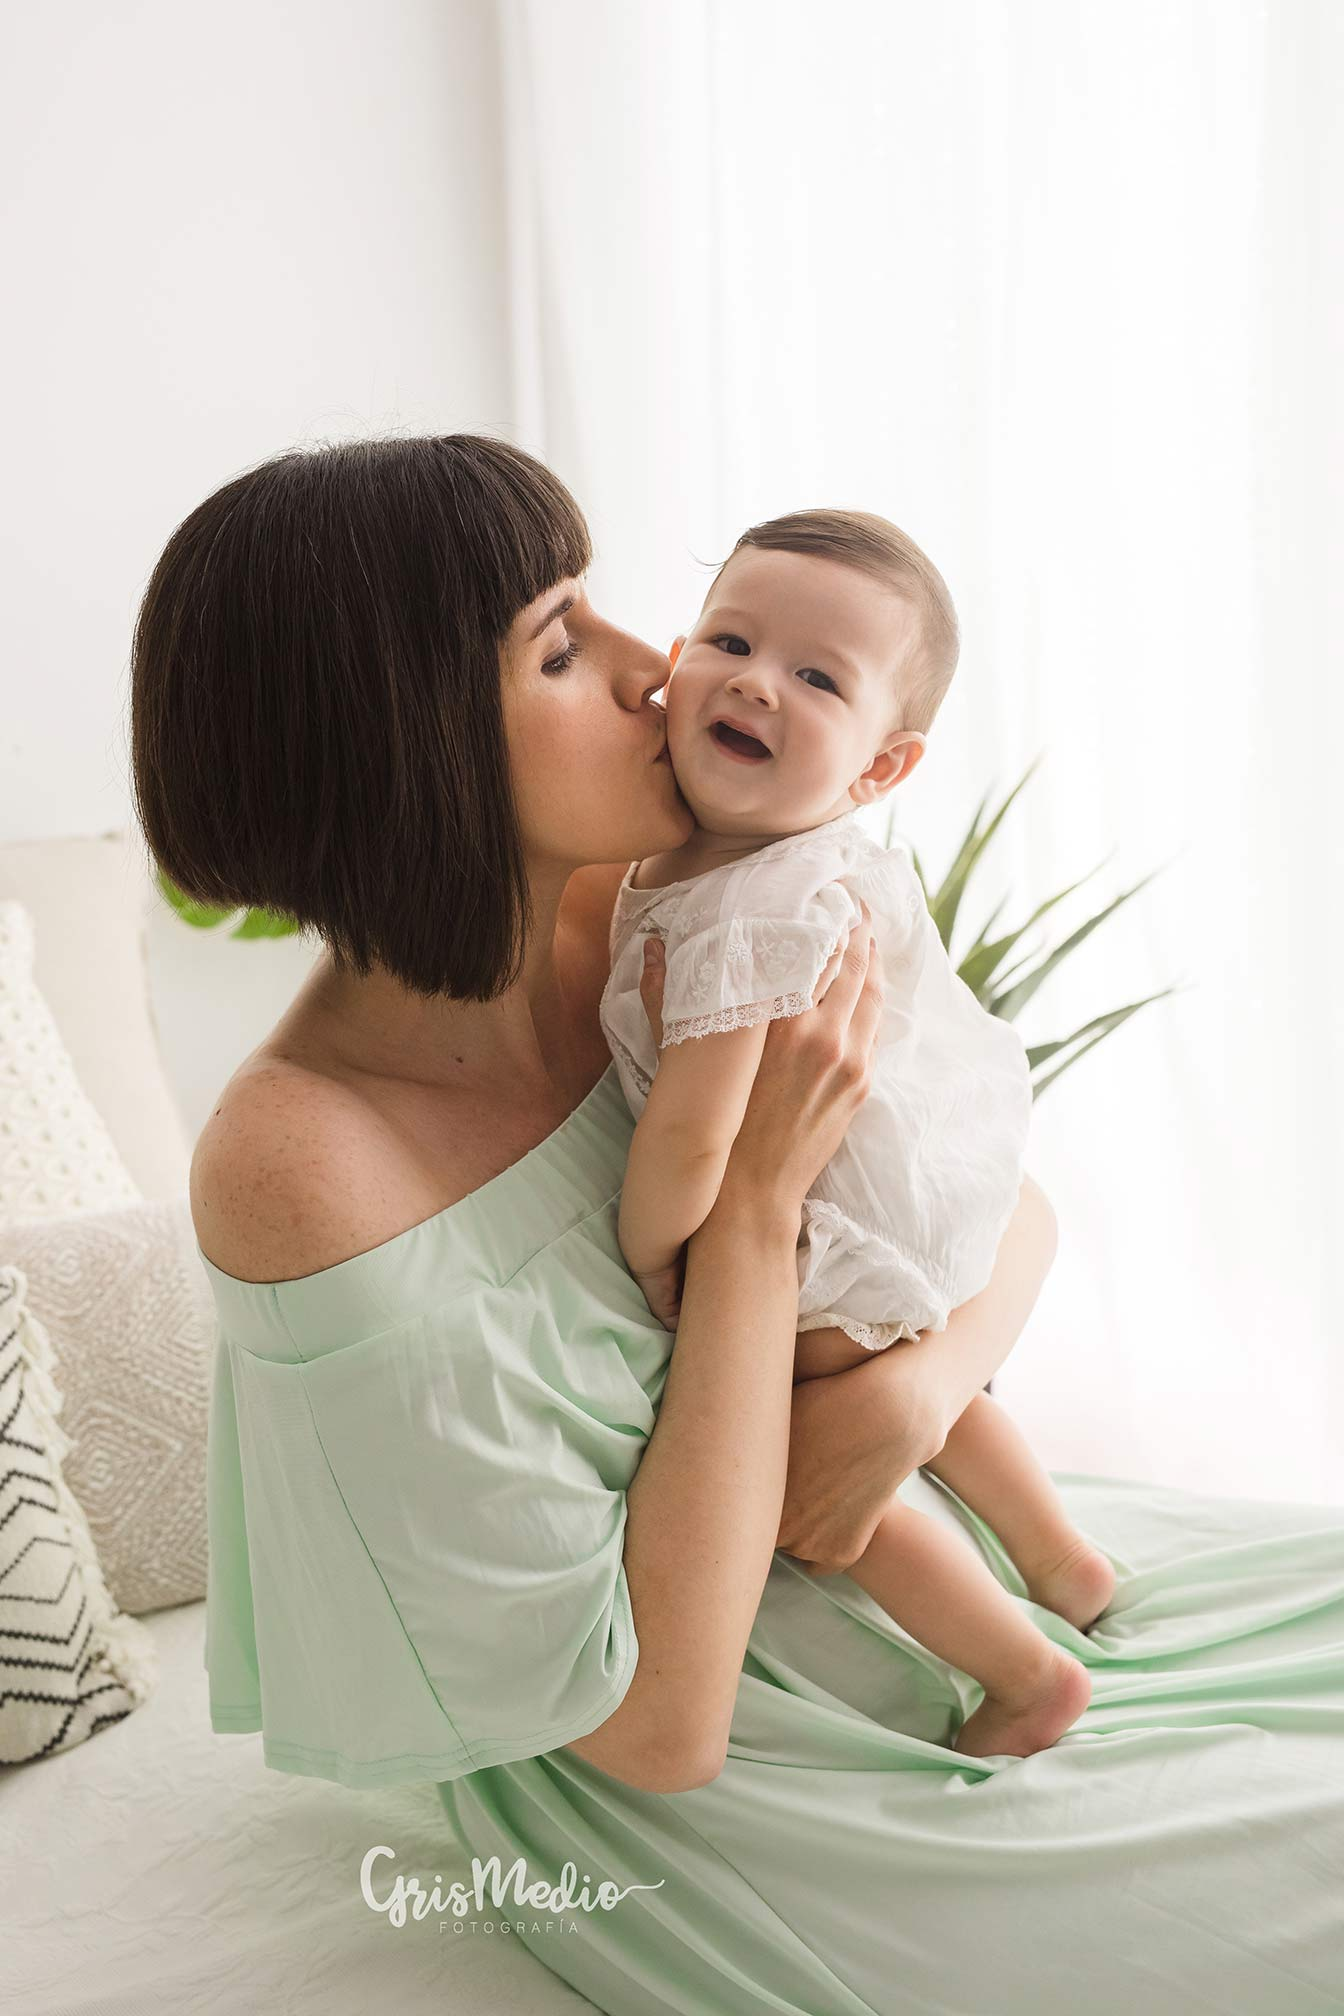 fotografia-familia-infantil-zaragoza-grismedio-bebe-lactancia6